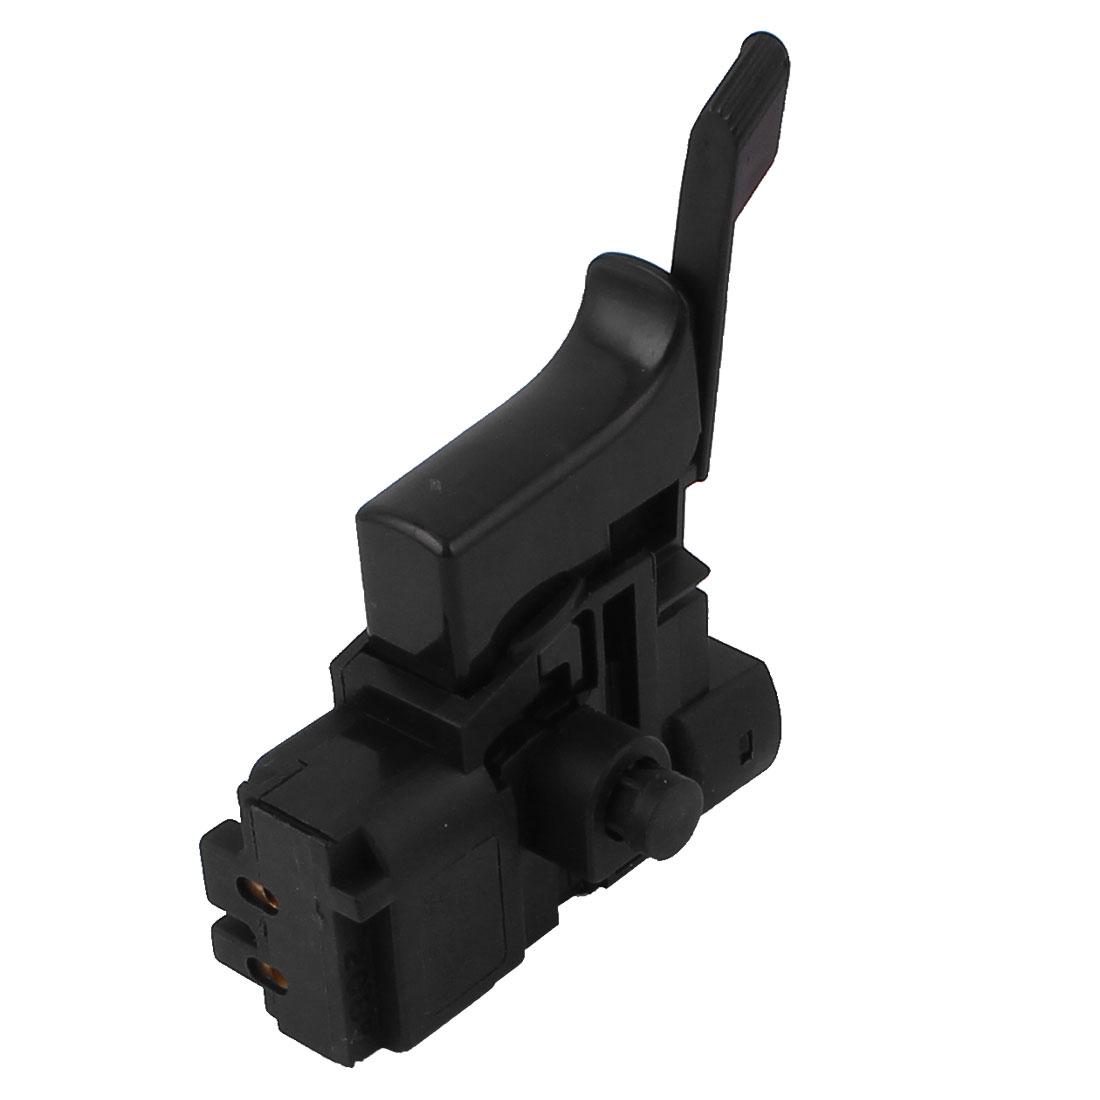 AC 250V 6A 125V 8A Lock On 4 Pins Trigger Switch for Bosch 24 Hammer Drill